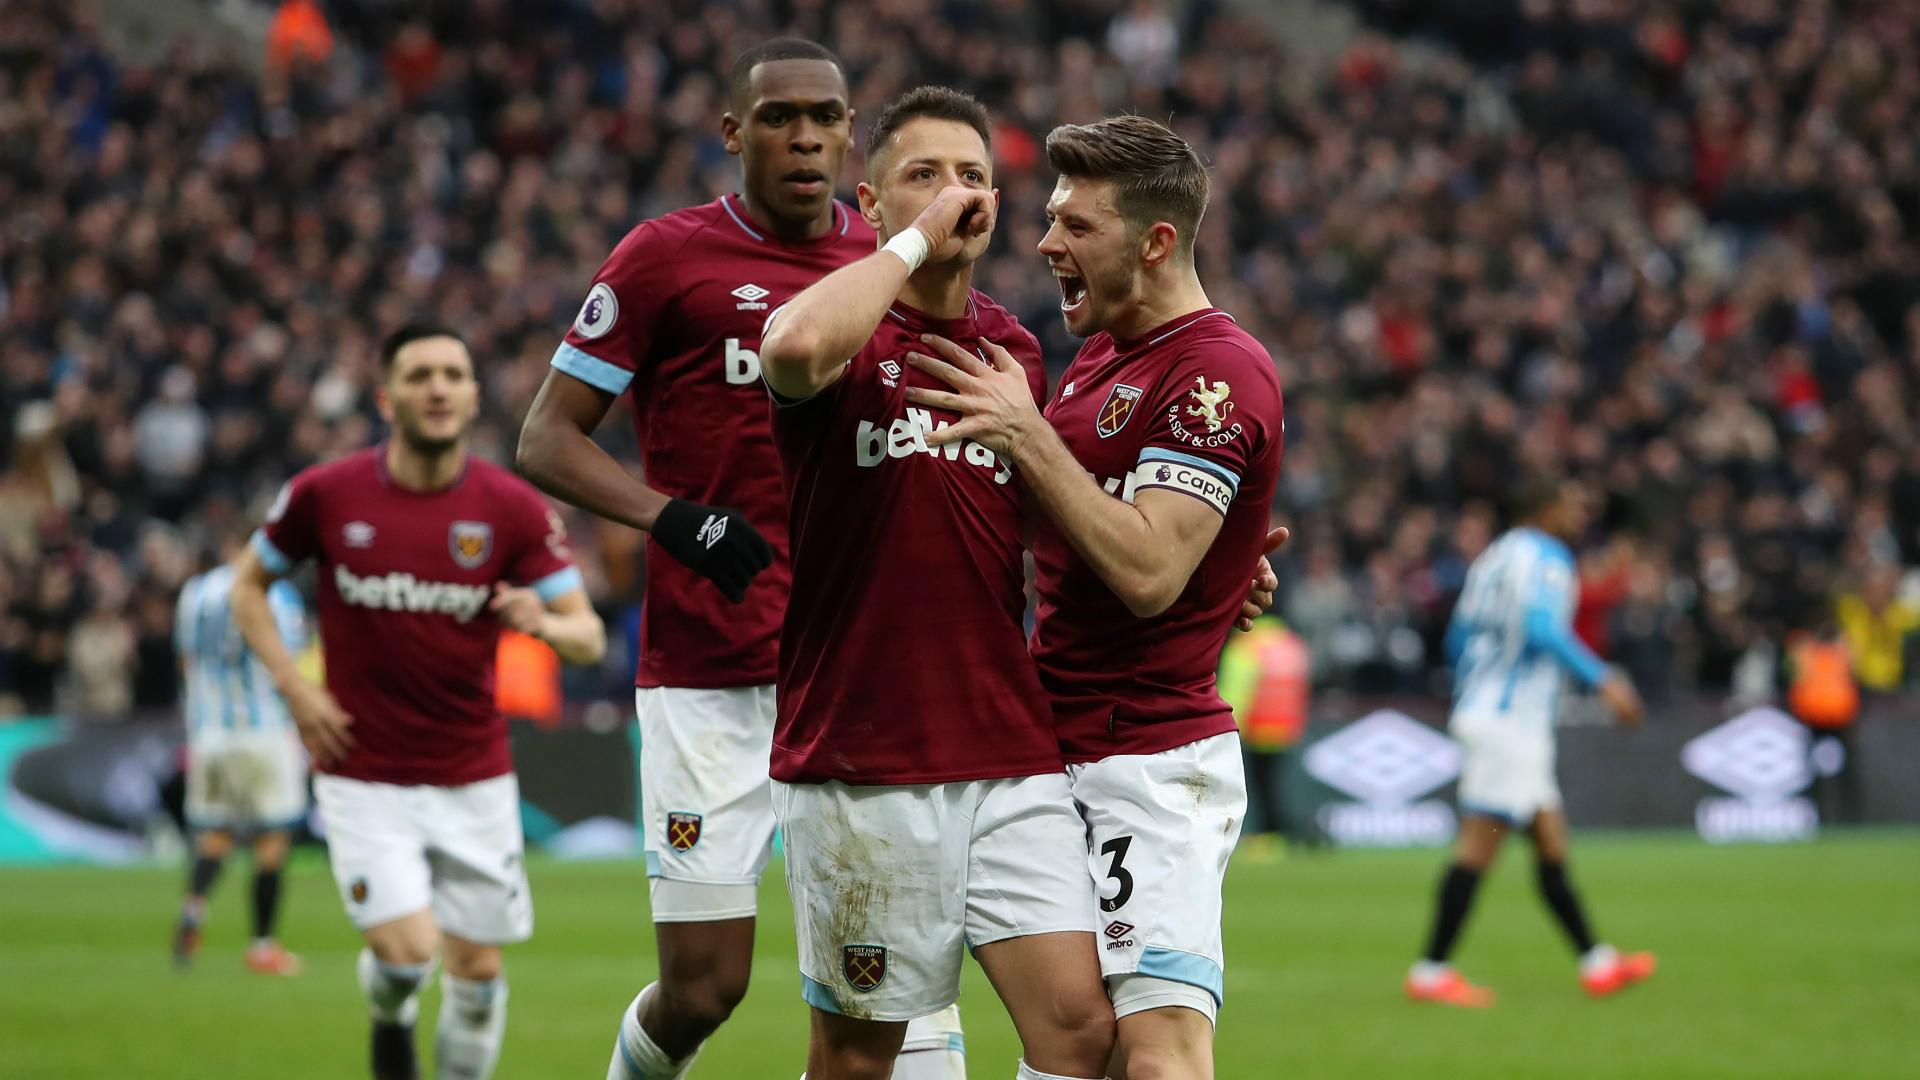 West Ham 4 Huddersfield Town 3: Hernandez's late show stuns Terriers